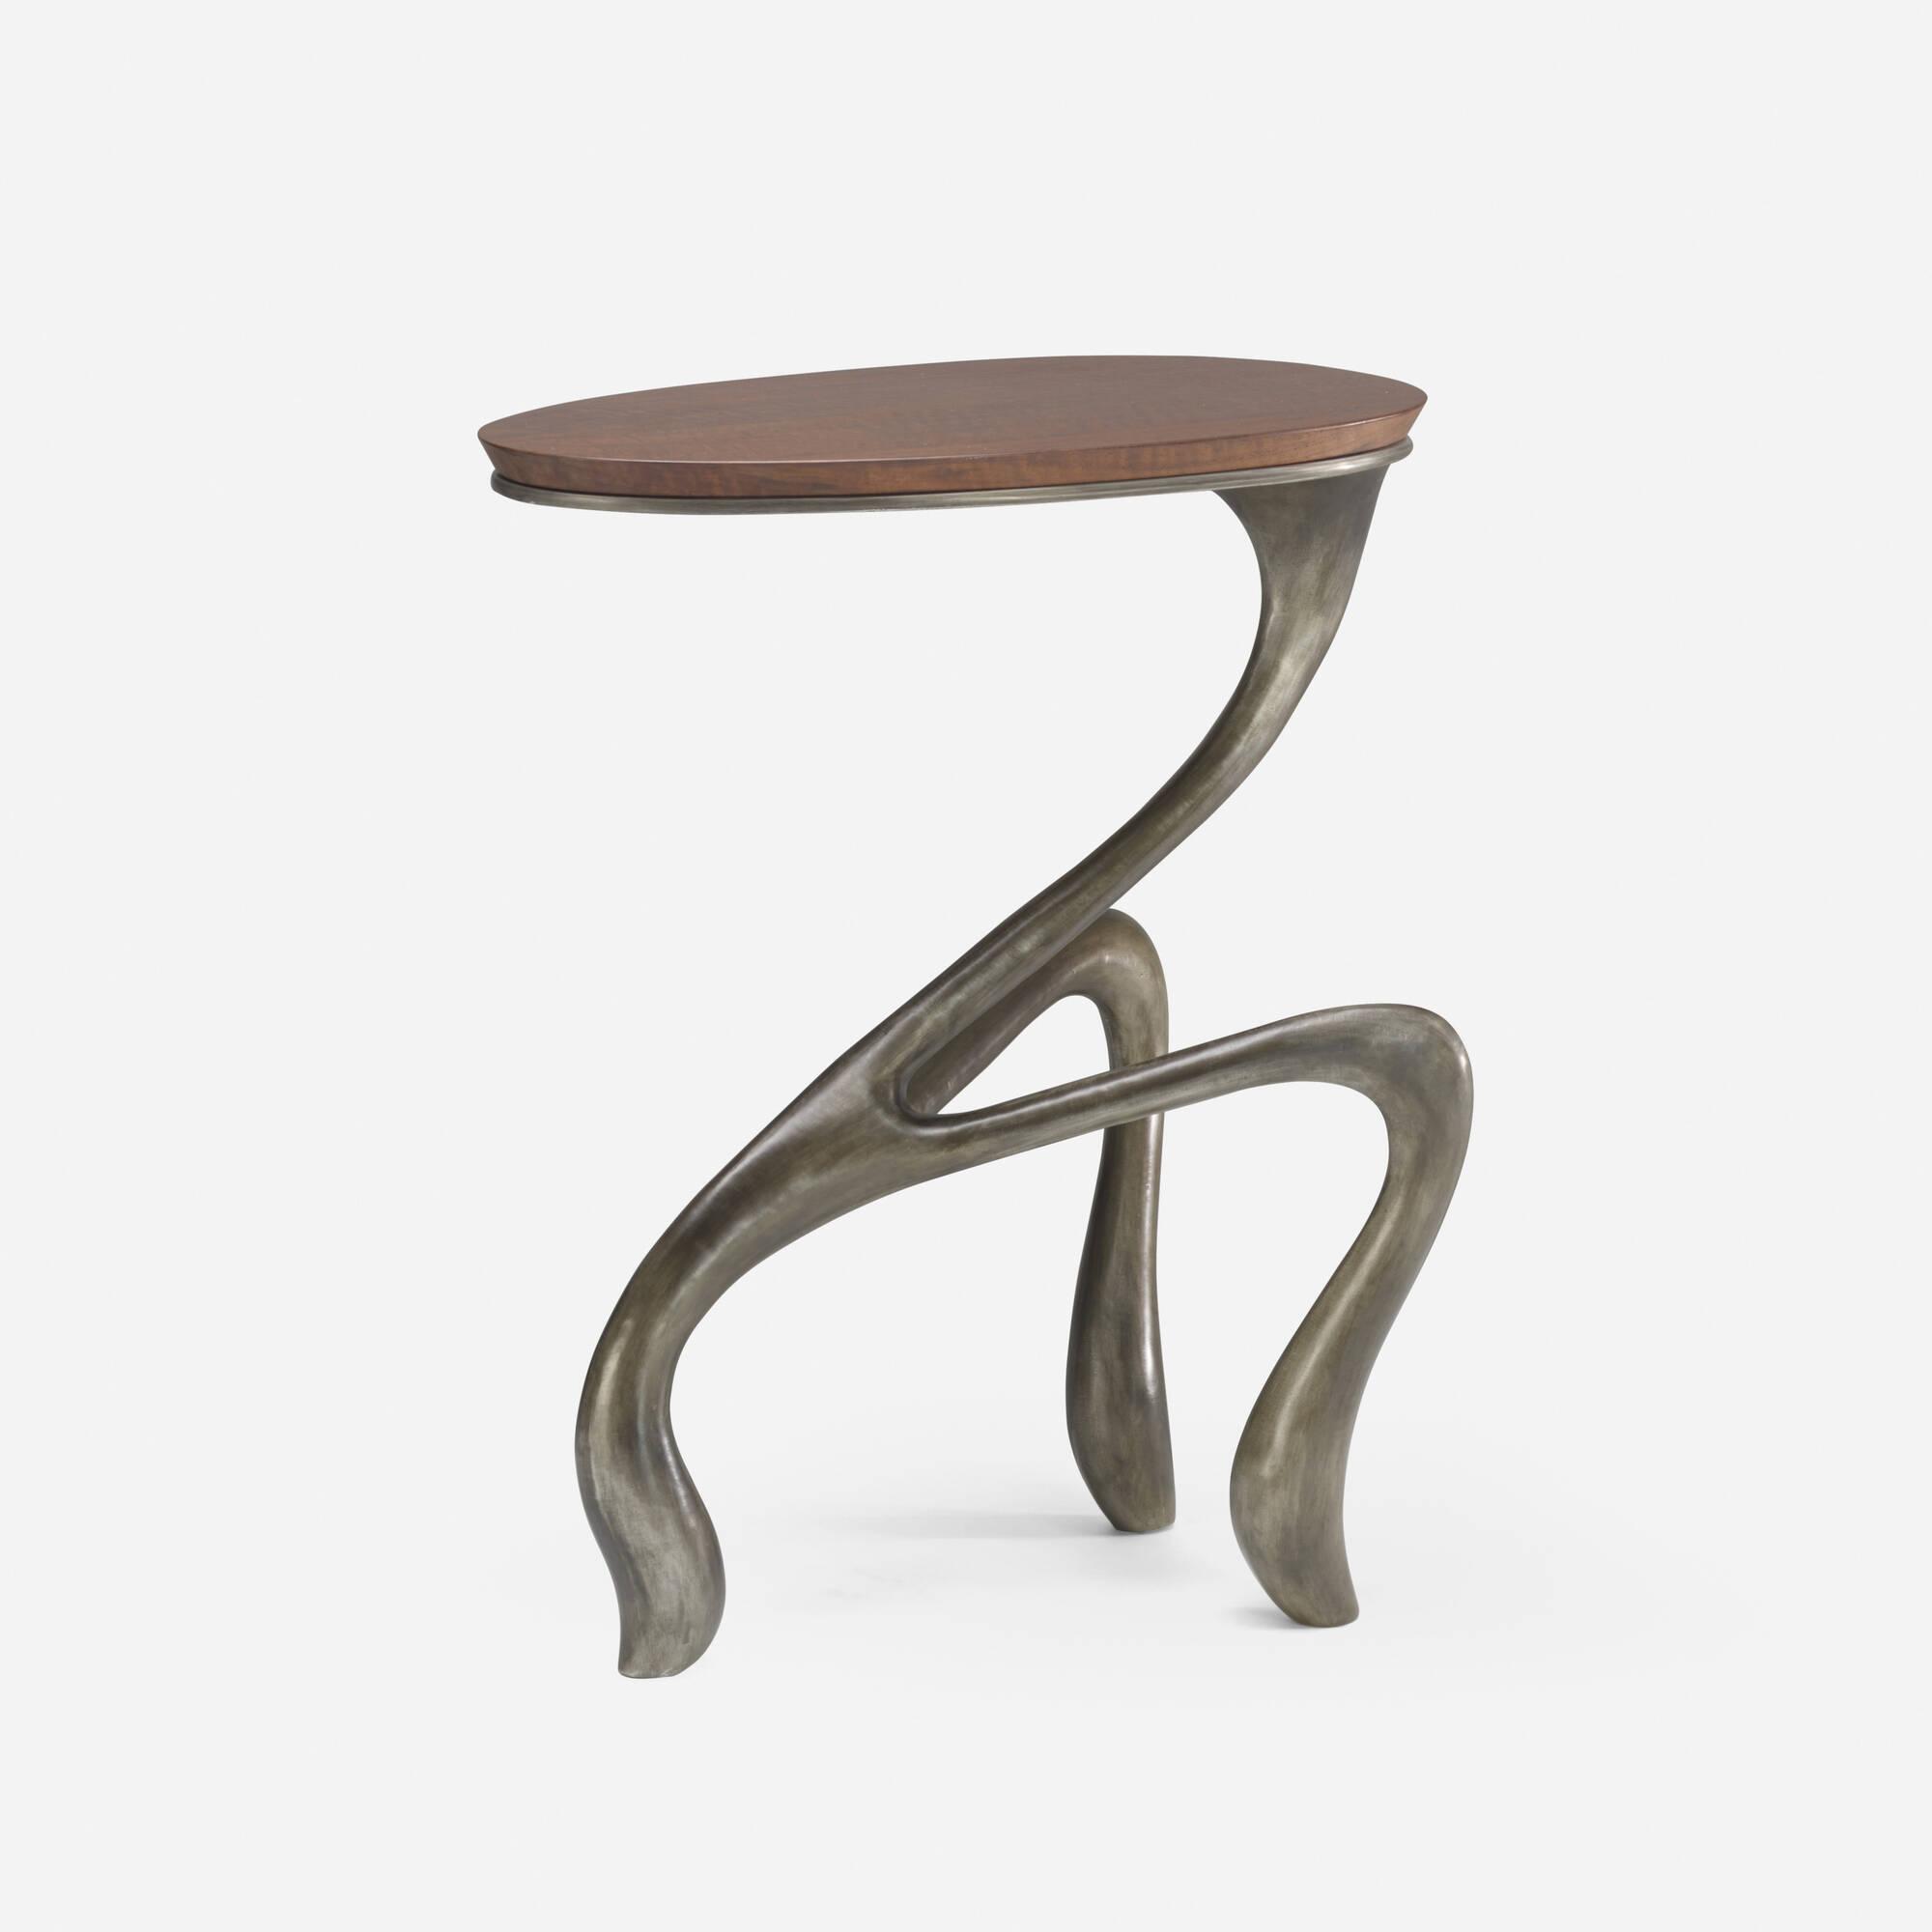 187: Jordan Mozer / Goose-Guss table (1 of 2)